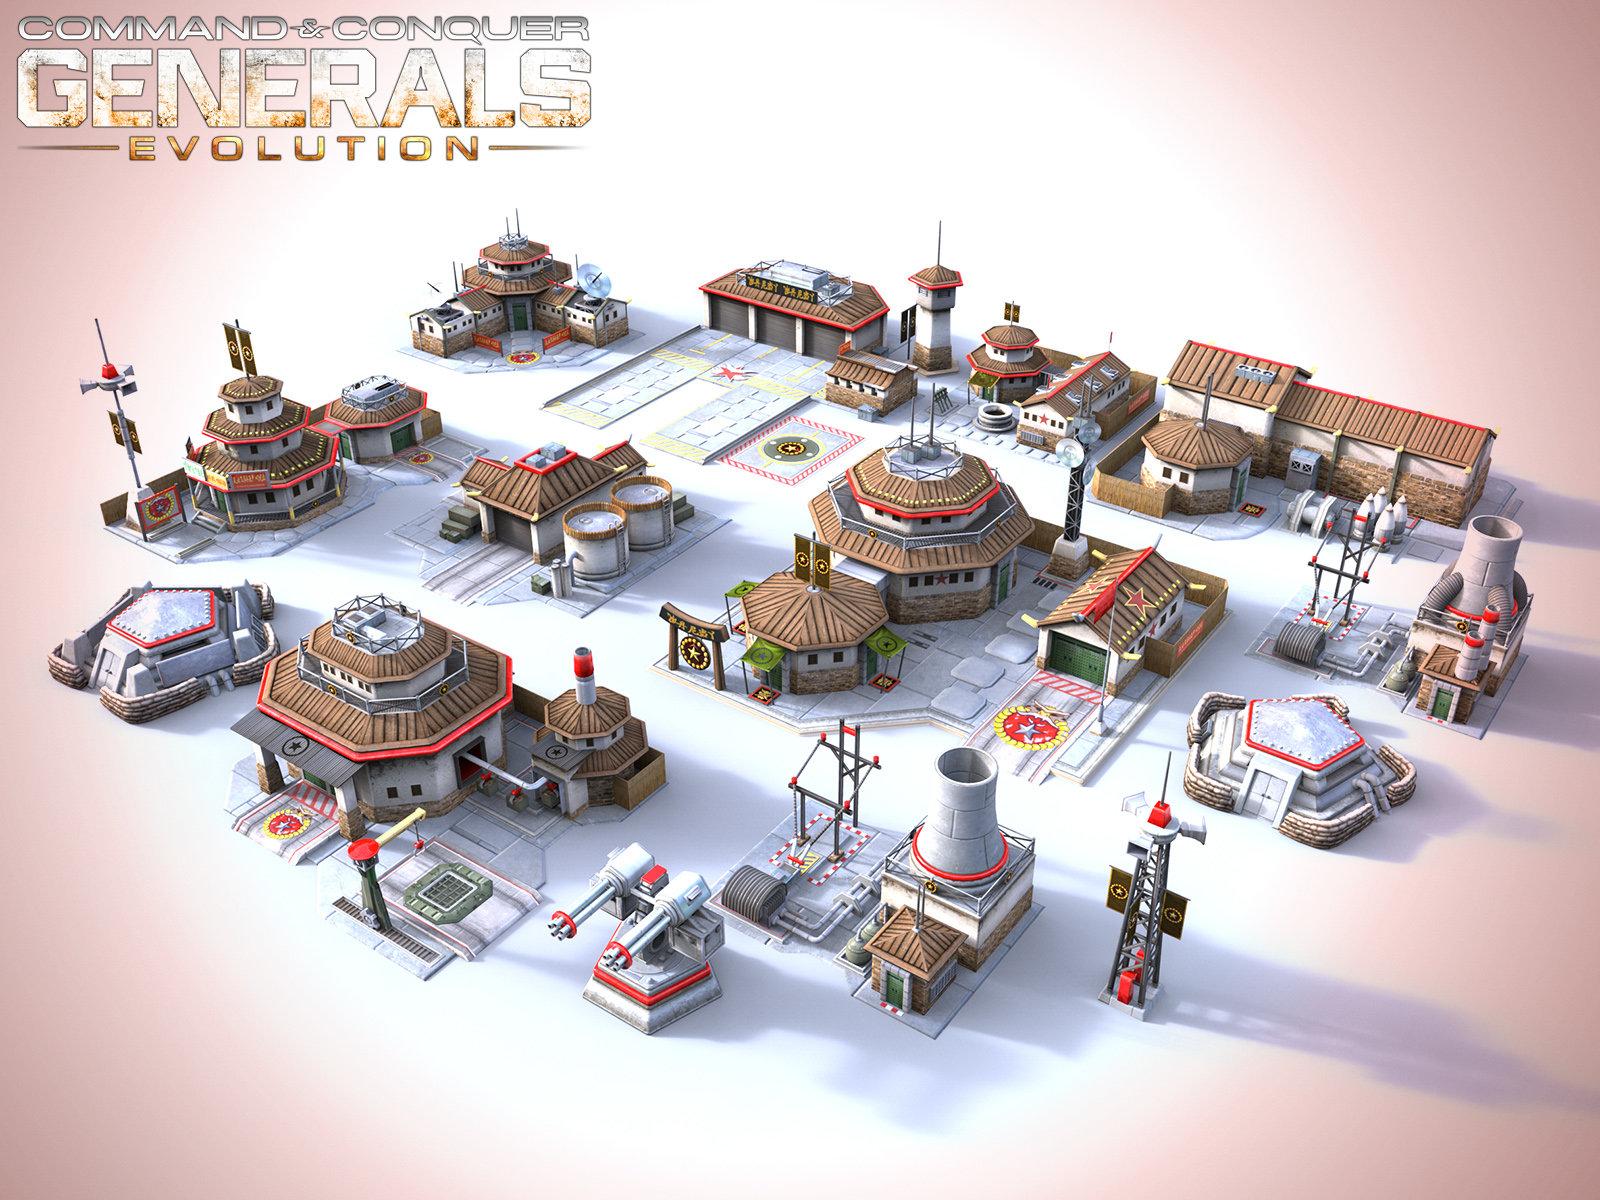 soenke-seidel-01-cnc-generals-evolution-china-buildings-render.jpg